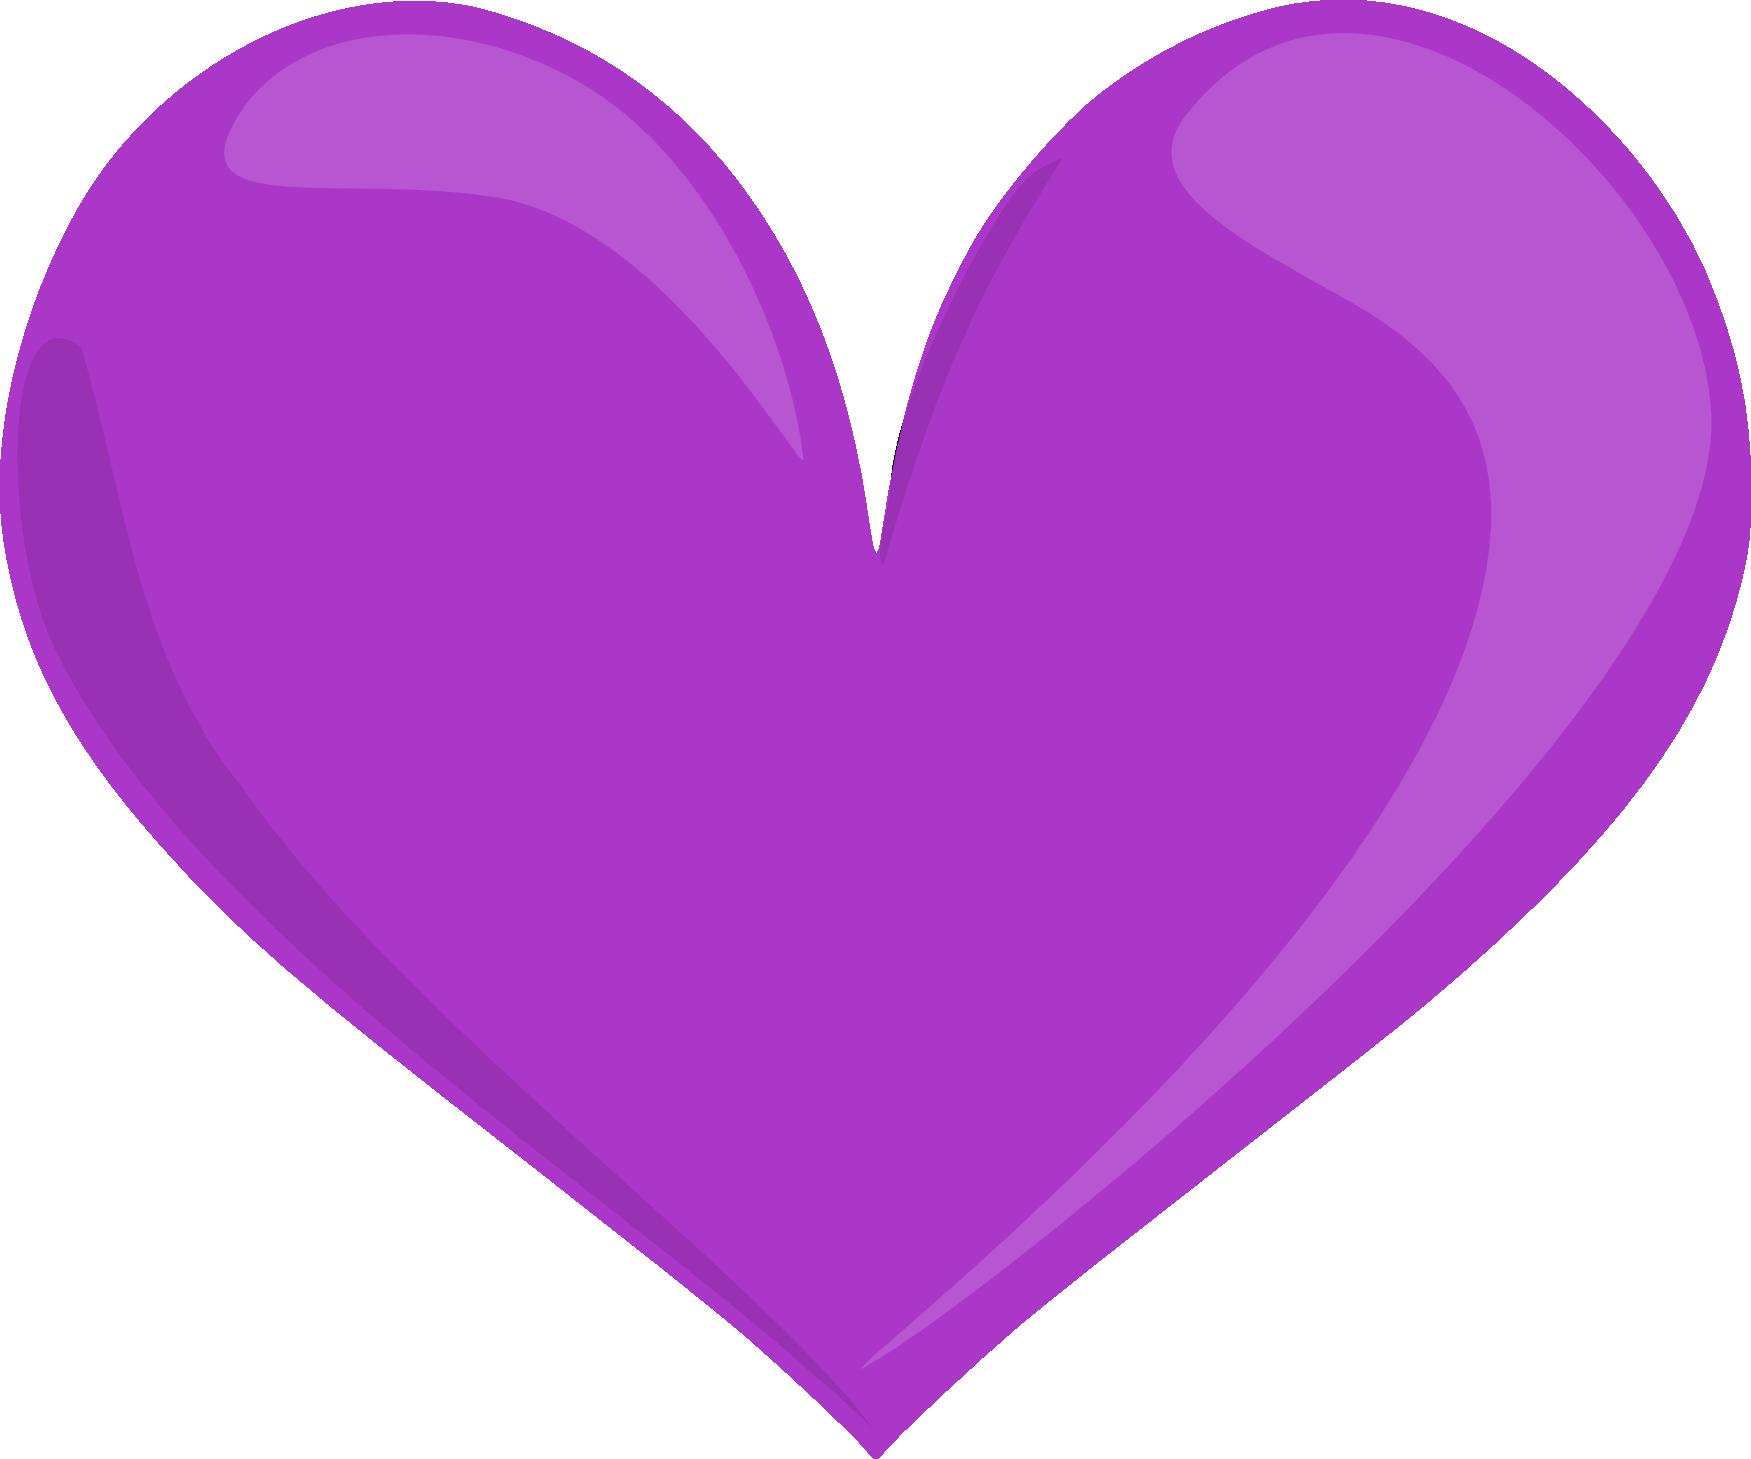 Hearts stormdesignz yellow heart. Glass clipart purple